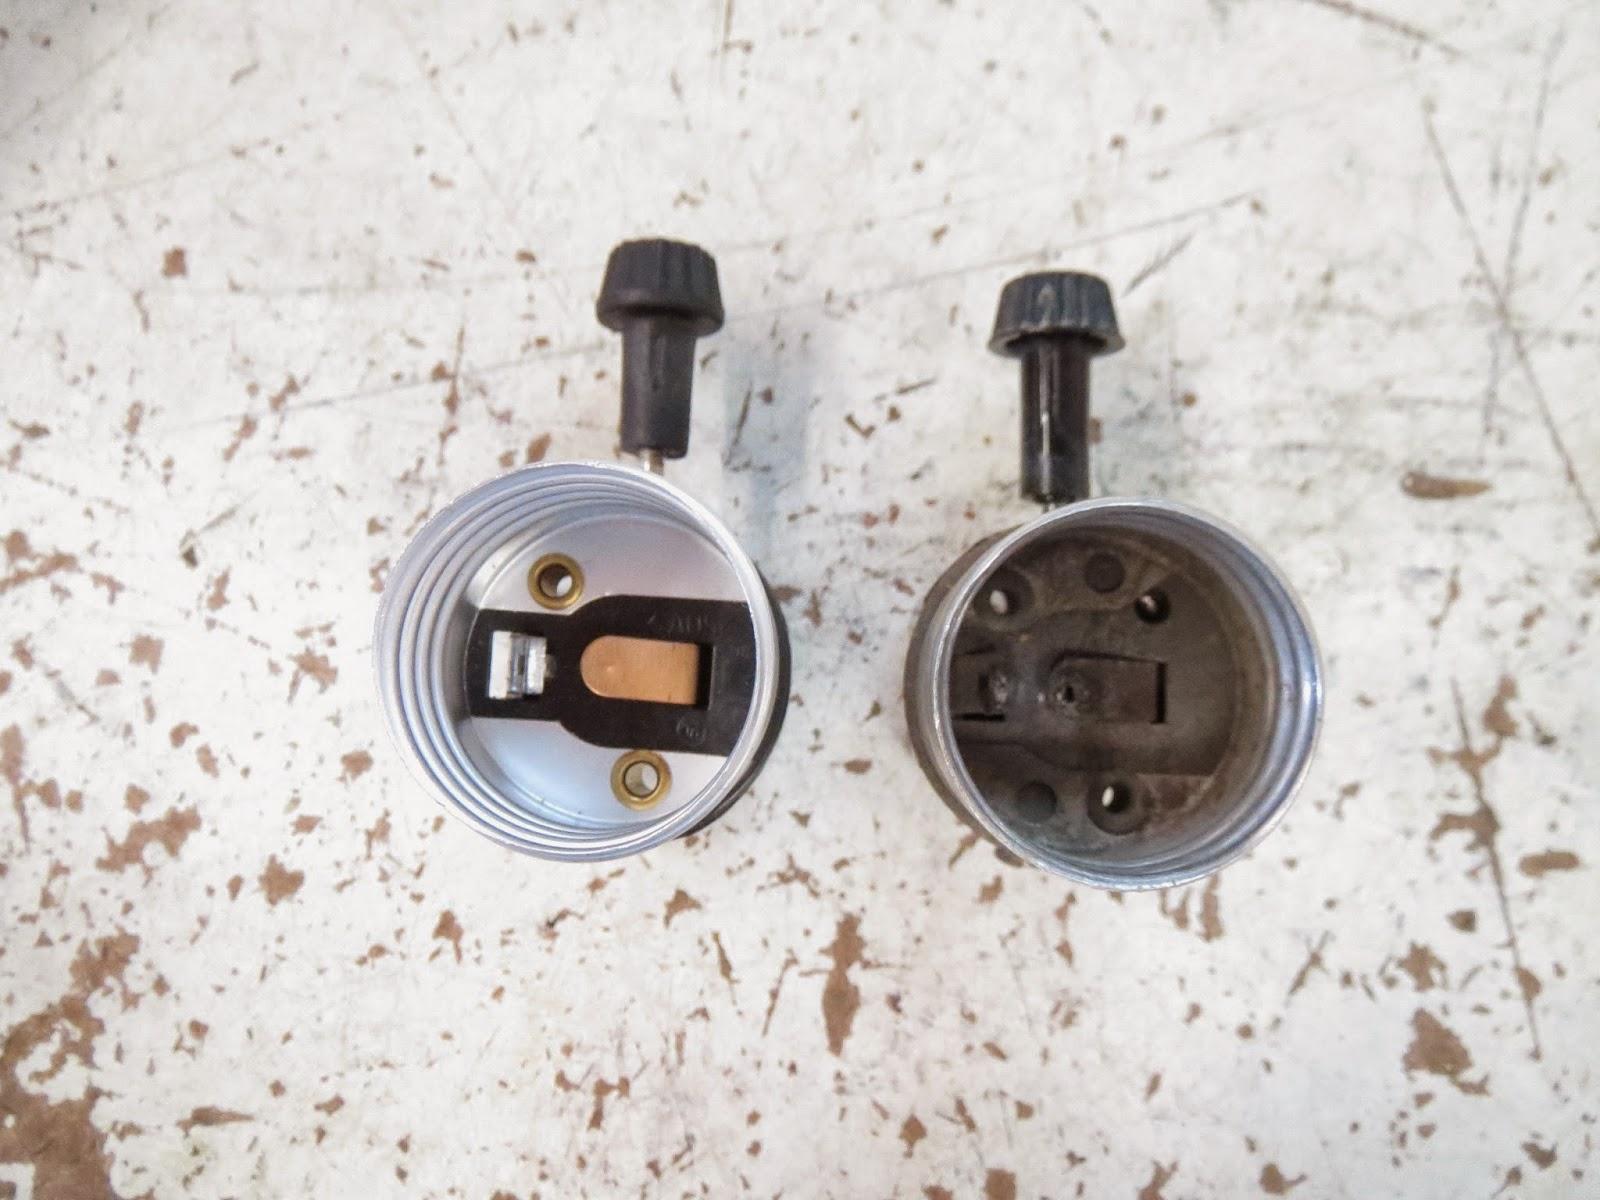 Lamp Parts and Repair   Lamp Doctor: 3 Way Sockets Vs. 3 ...